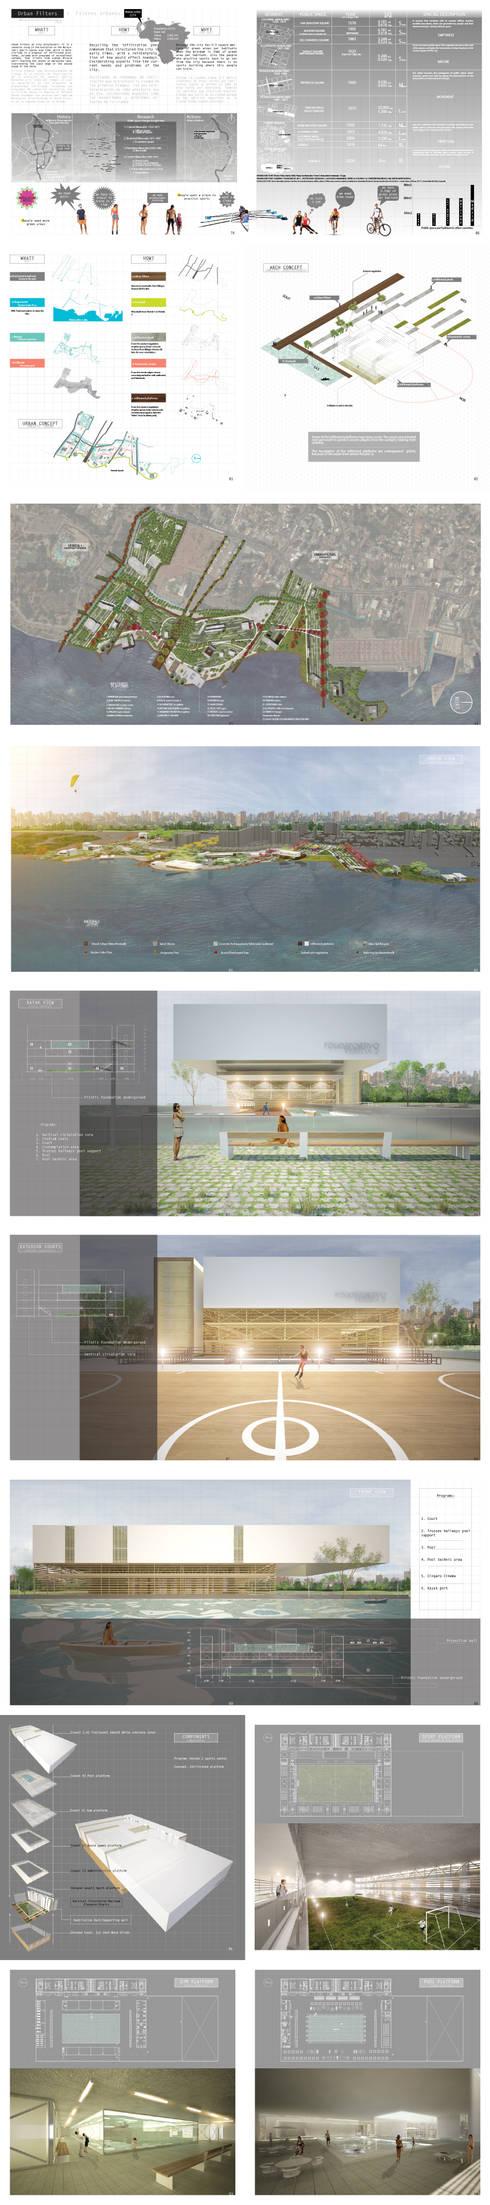 Filtros Urbanos\Polideportivo Vereda 2: Jardines de estilo minimalista por Gloriana Rada